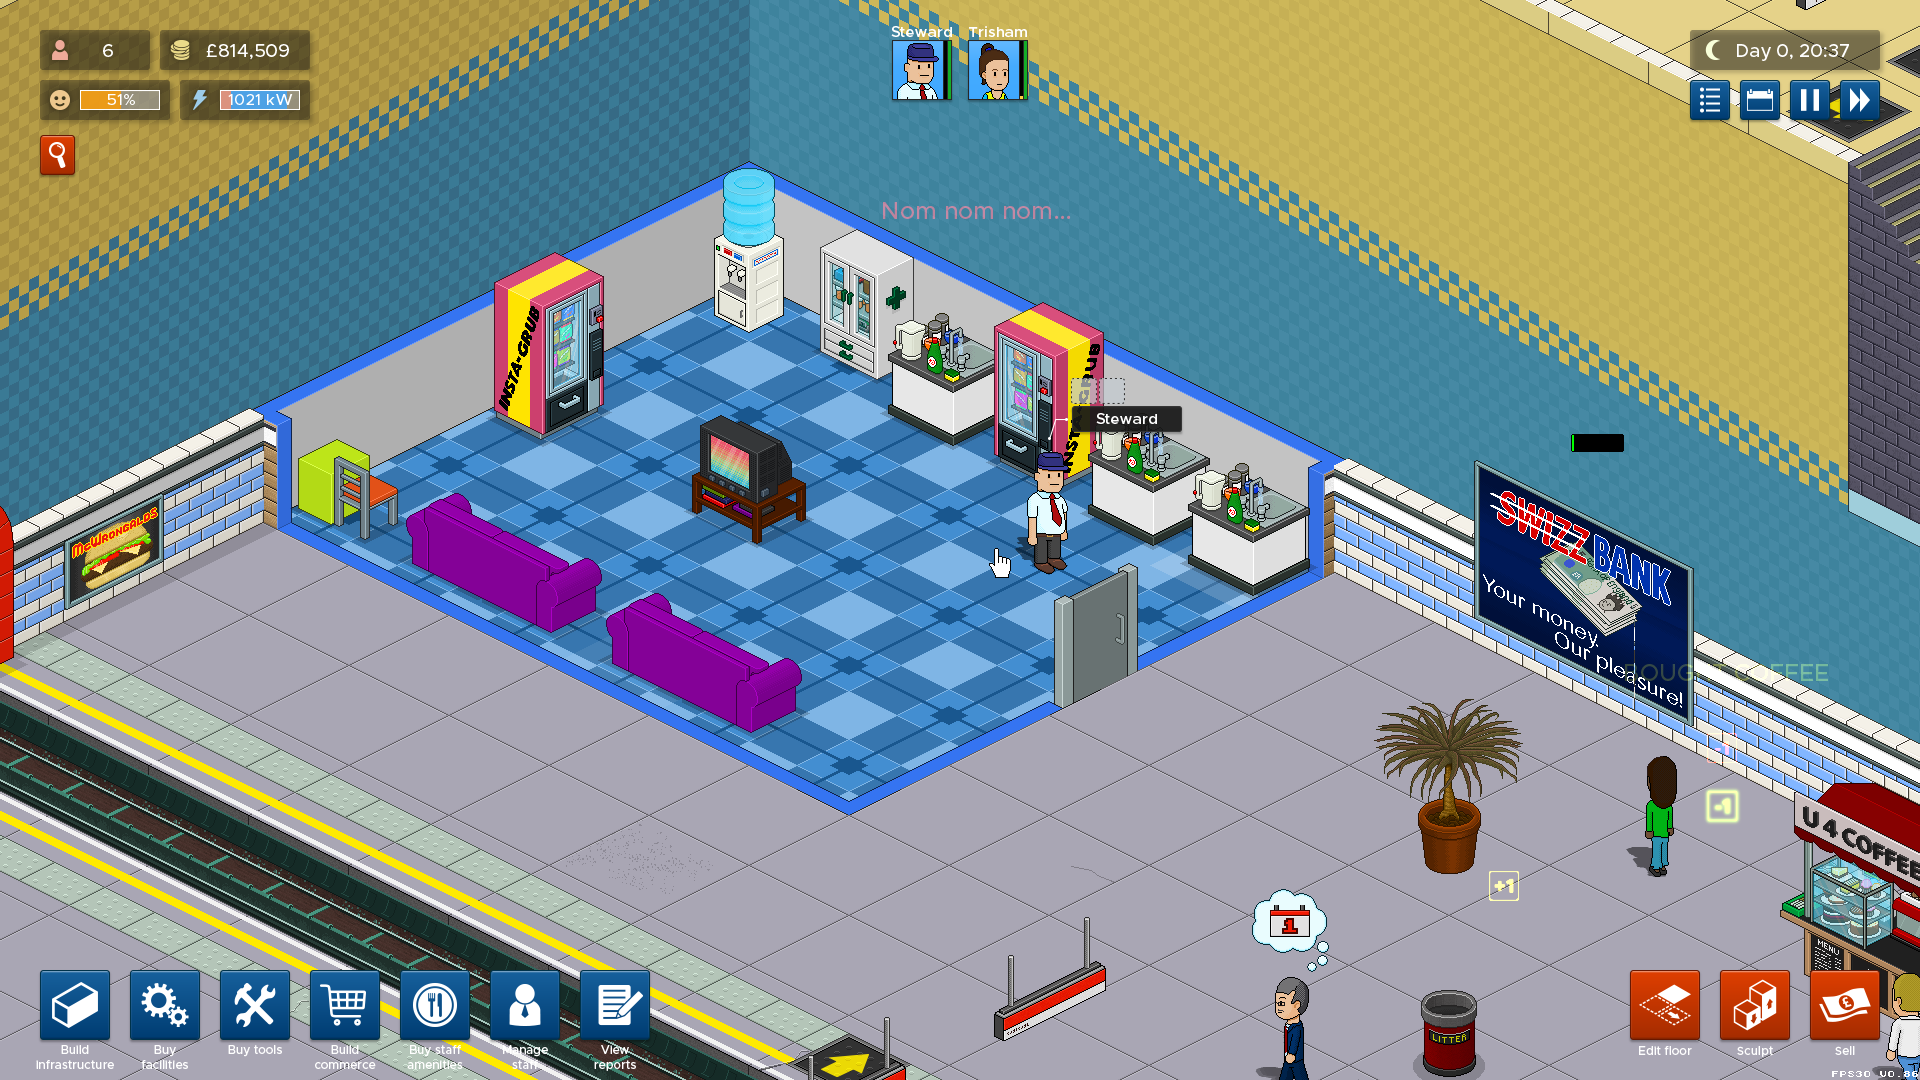 Overcrowd staff room